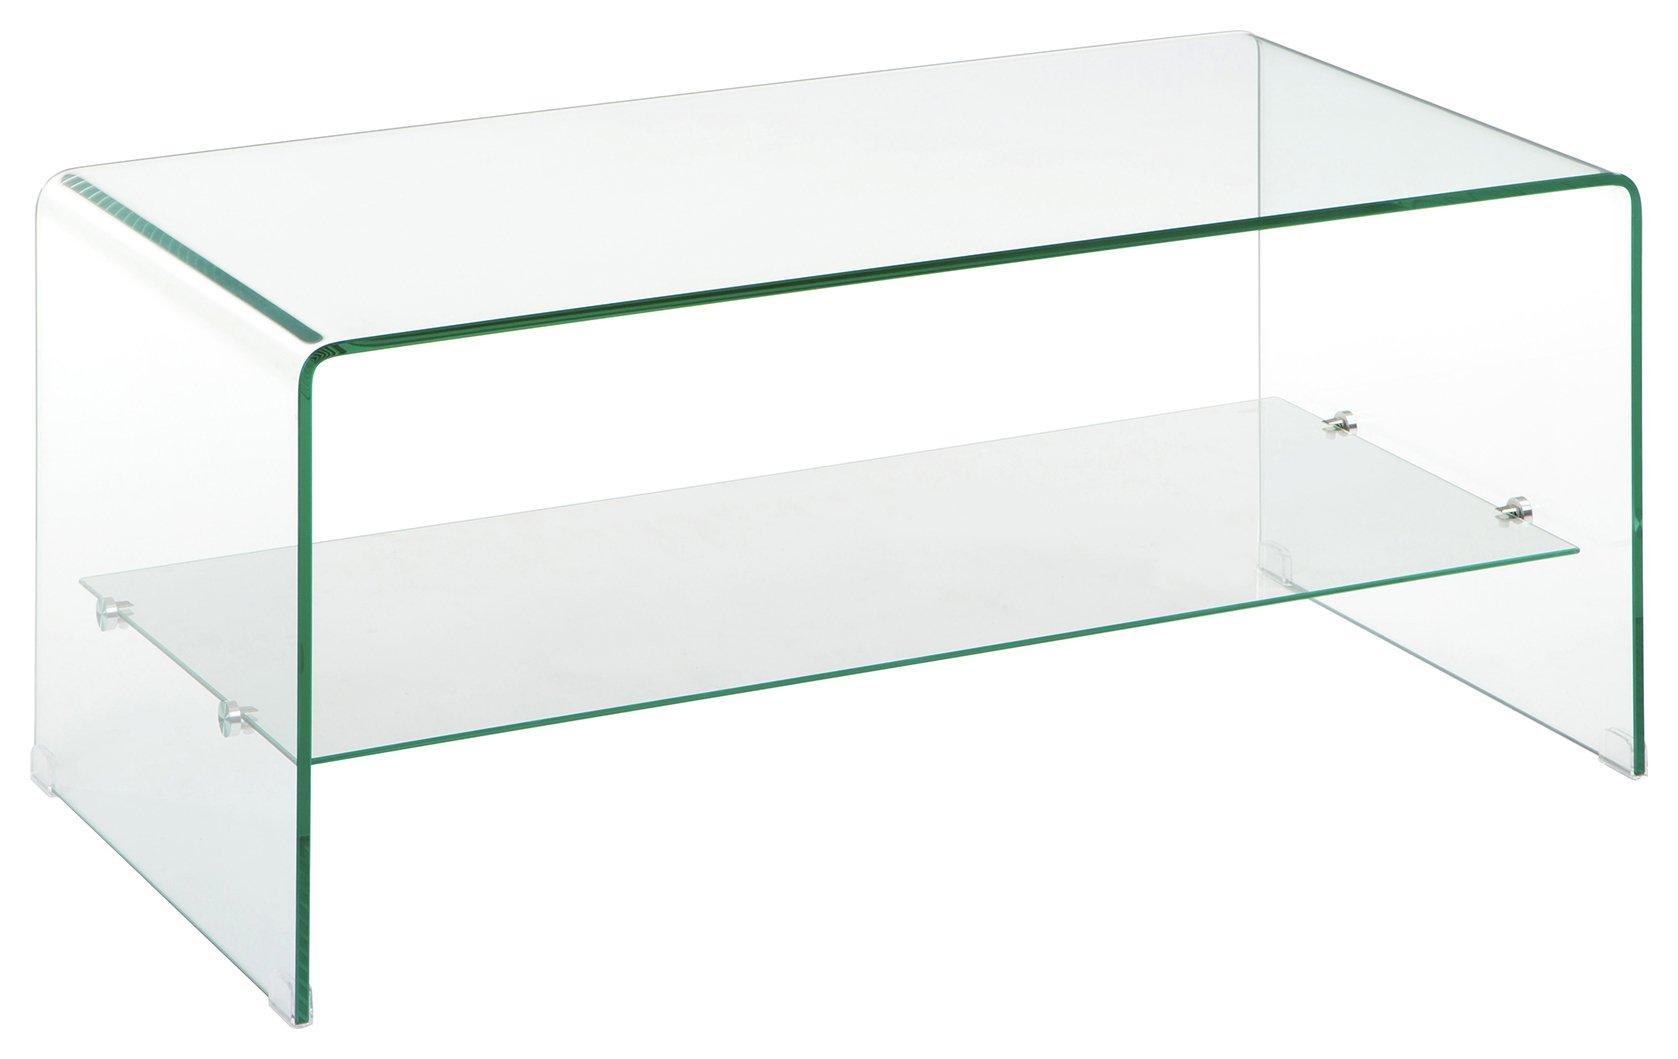 Premier Housewares Matrix 2 Tier Clear Glass Coffee Table